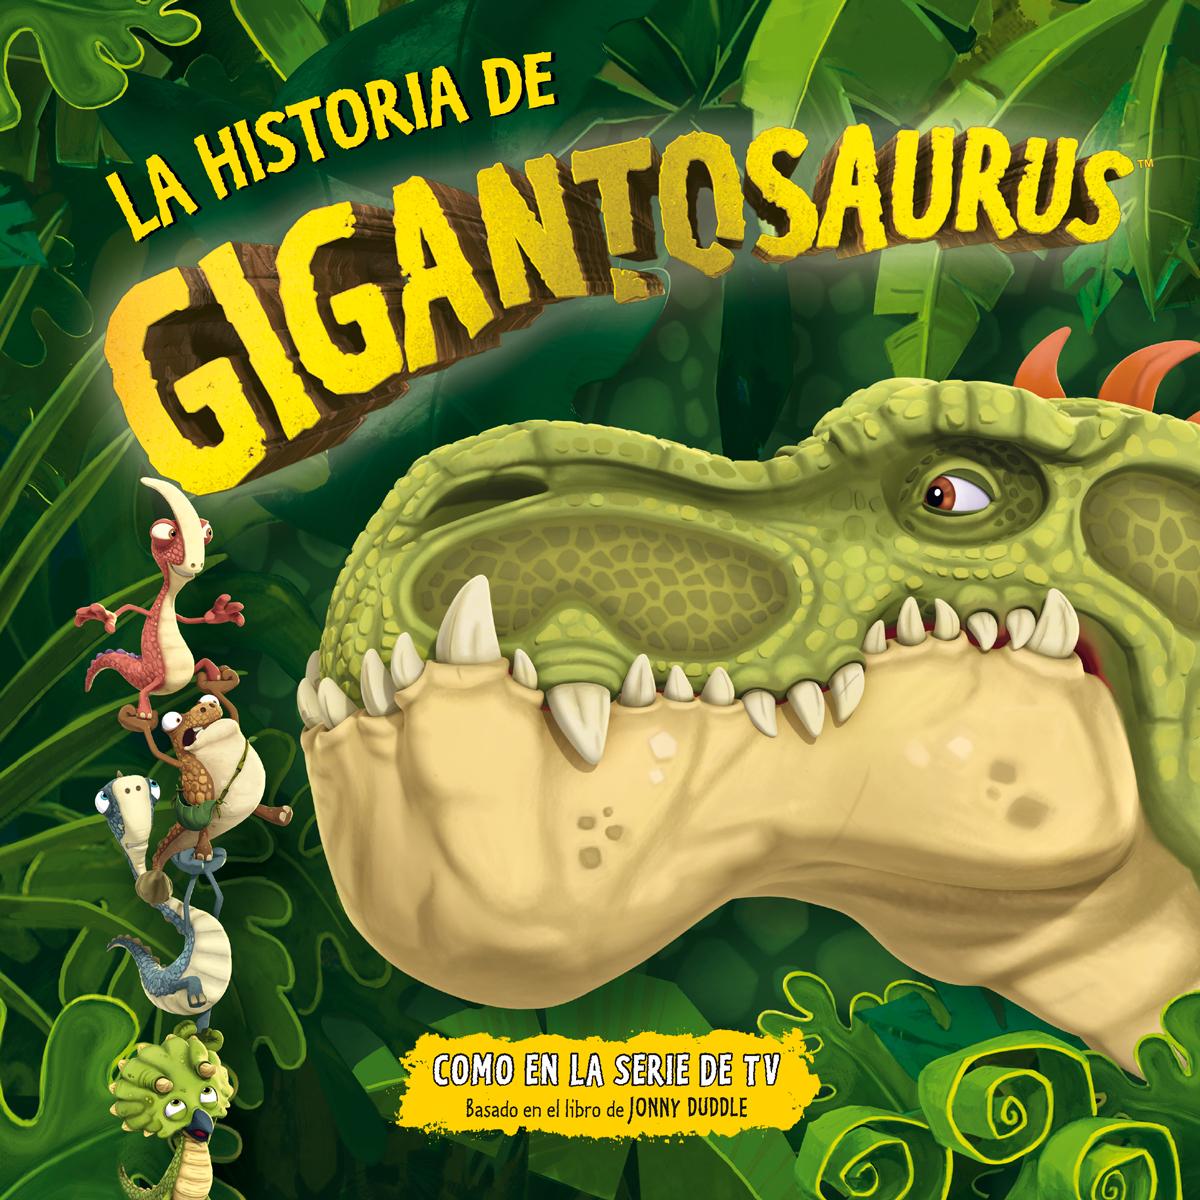 La historia de Gigantosaurus